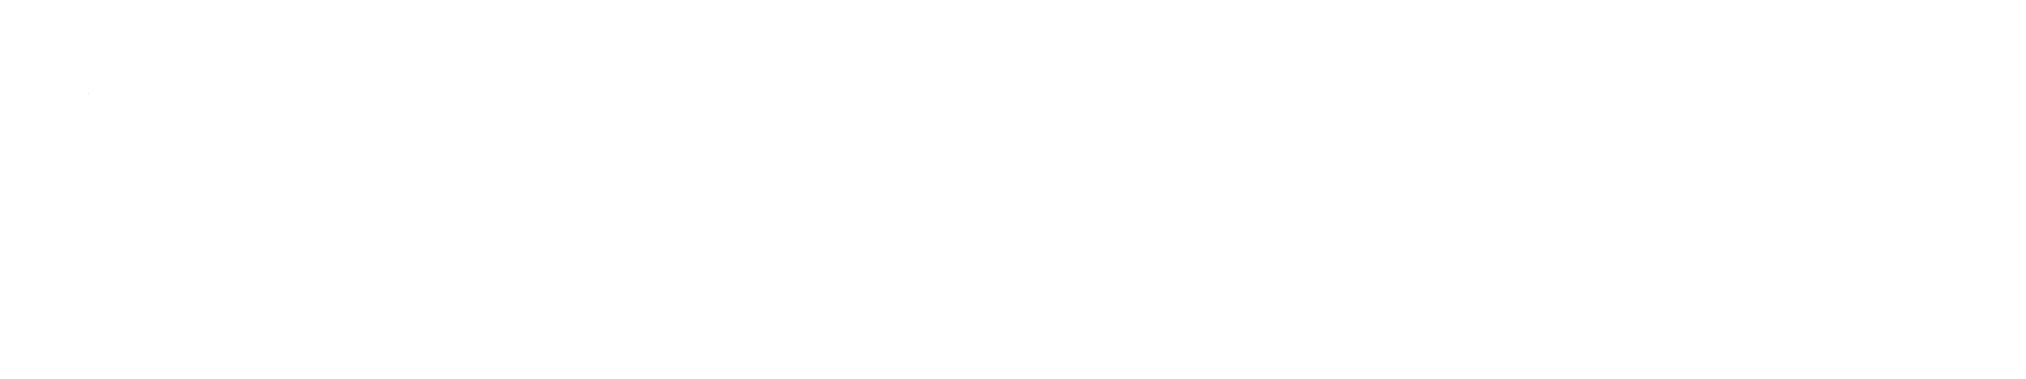 logo-gordiola-blanco-vidrio-soplado